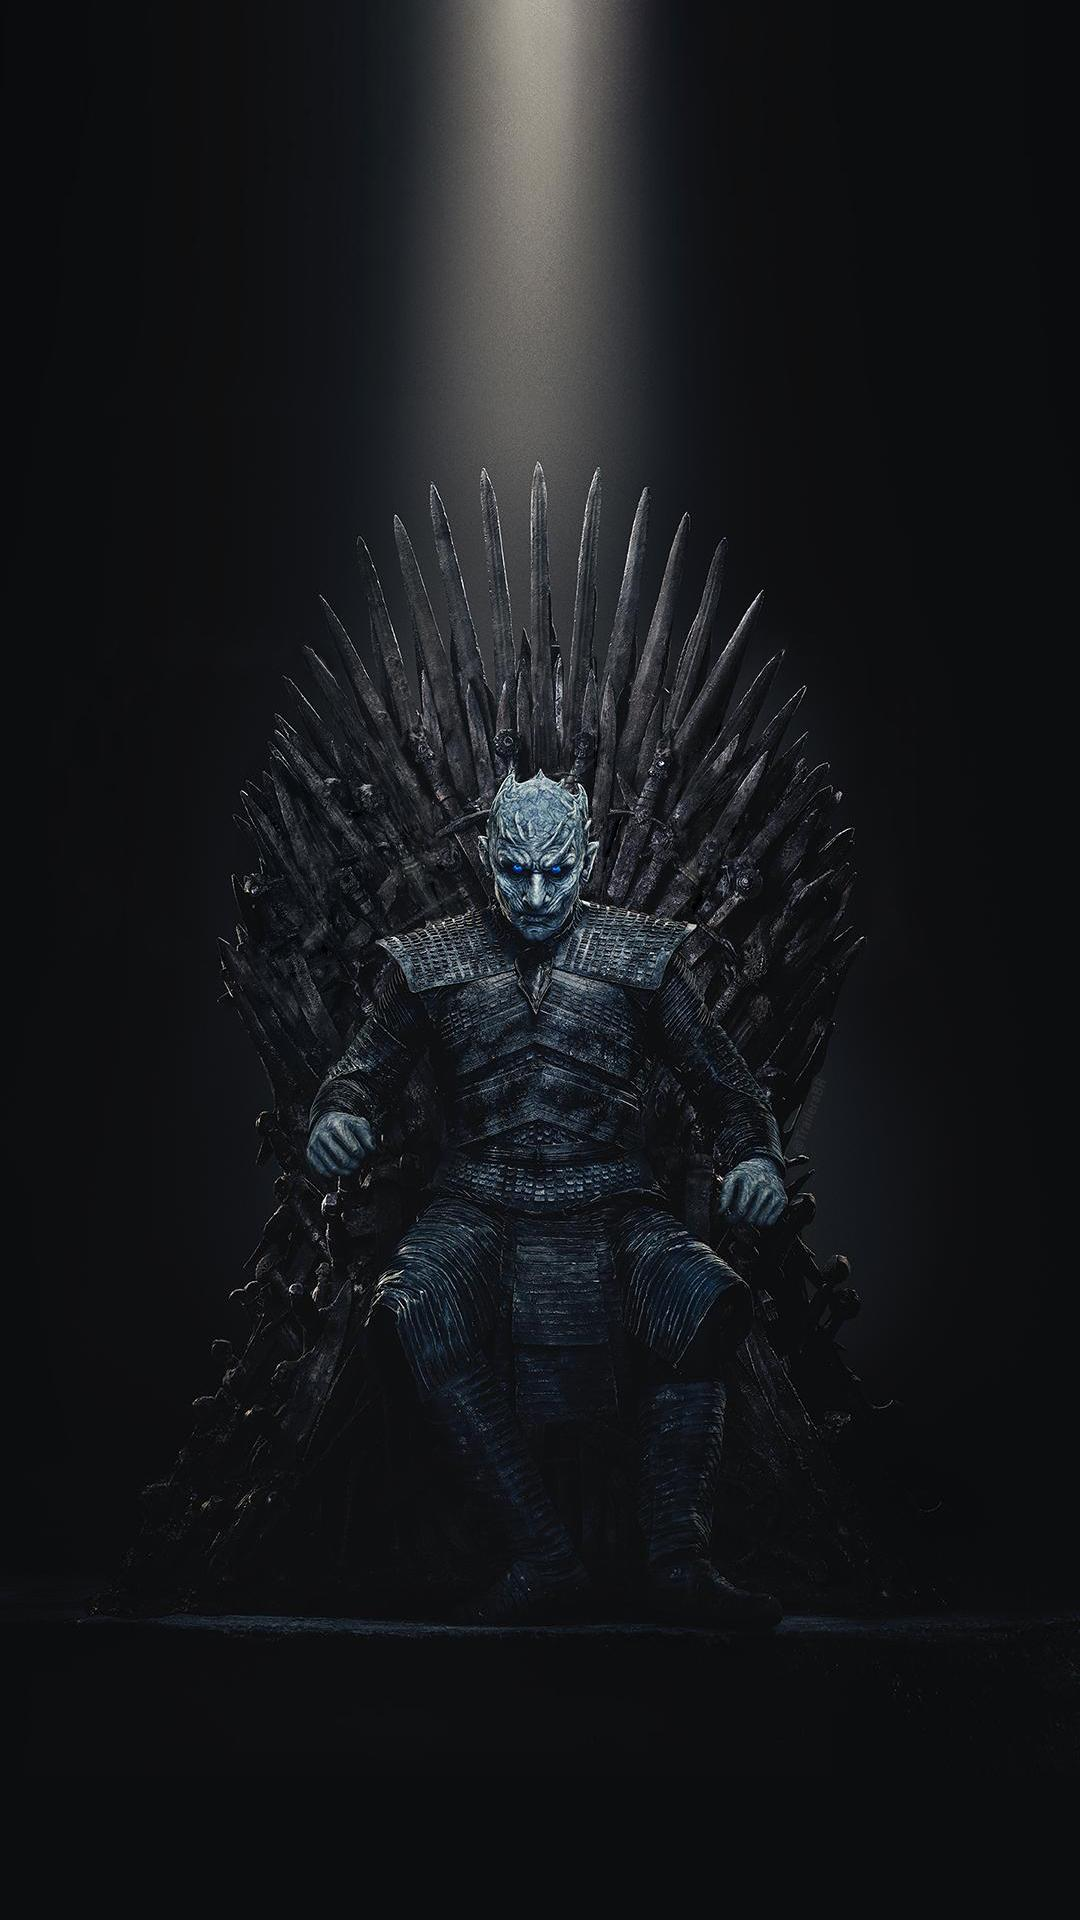 Spoilers[spoilers] Night King Iron Throne Wallpaper - Night King Sits On Iron Throne , HD Wallpaper & Backgrounds